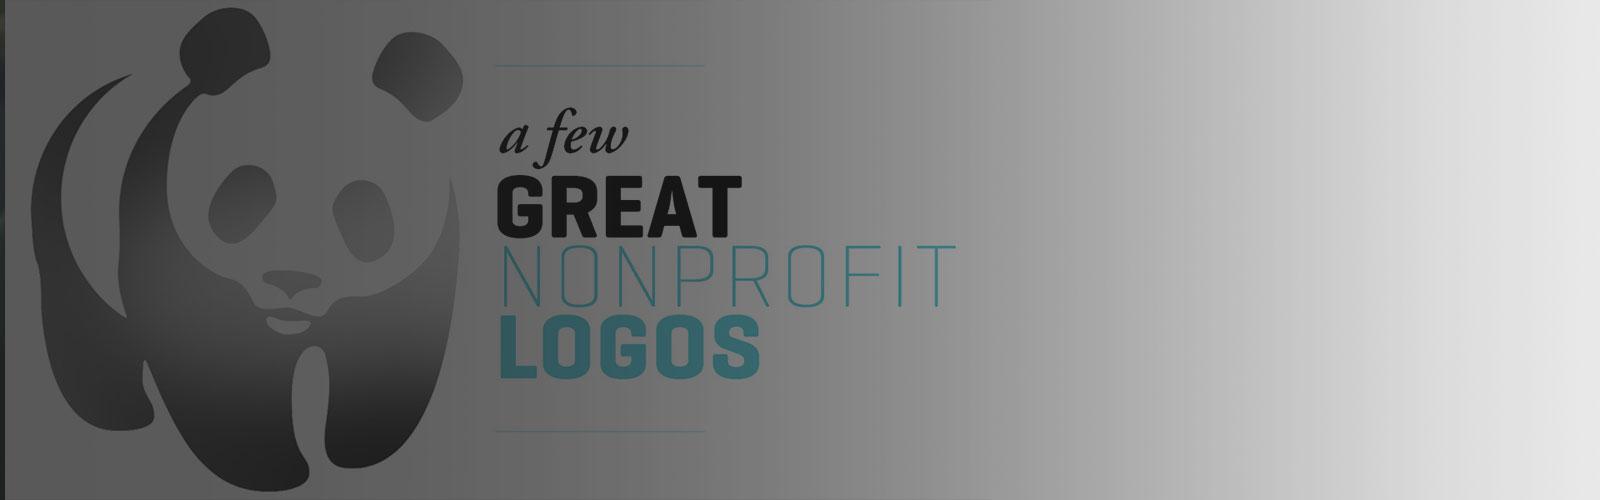 6 Great Nonprofit Logos